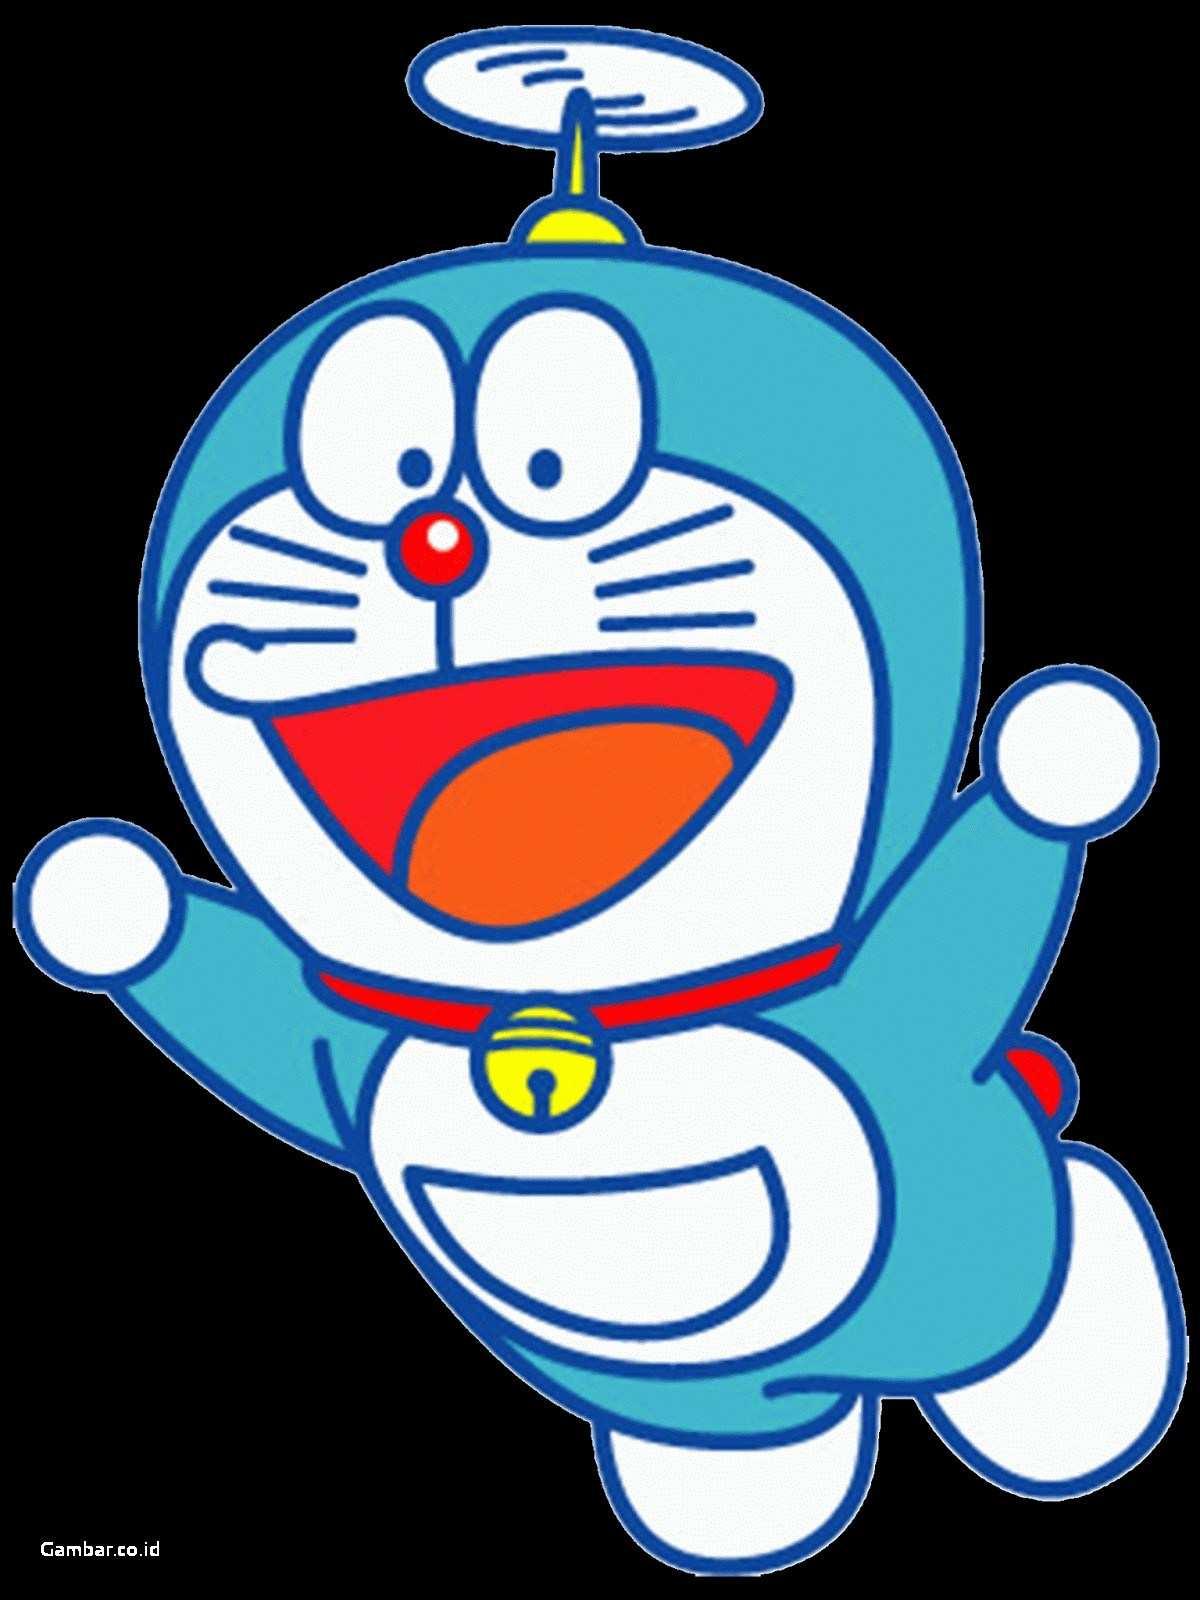 Gambar Kartun Doraemon Keren - Doraemon I Love You , HD Wallpaper & Backgrounds